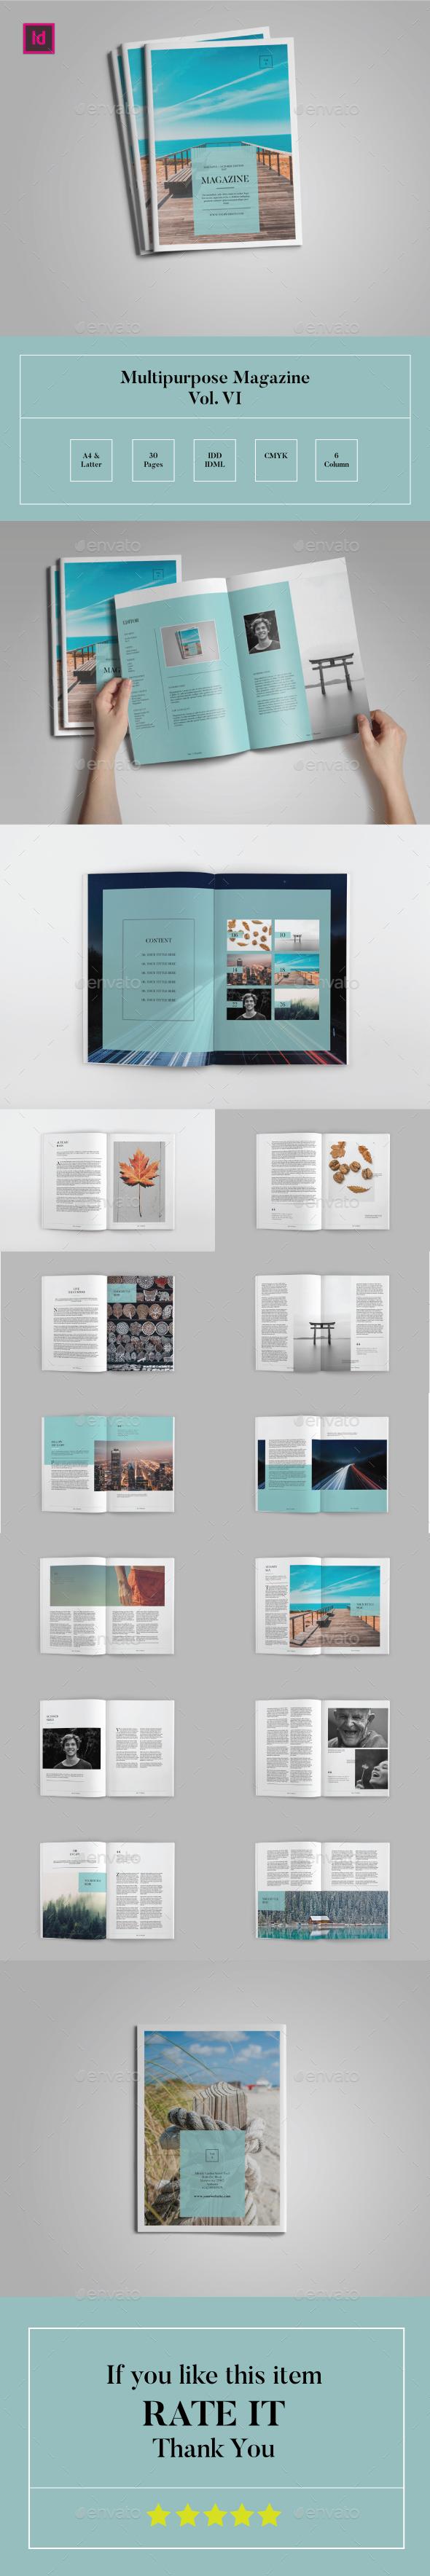 Multipurpose Magazine Template Vol.VI - Magazines Print Templates